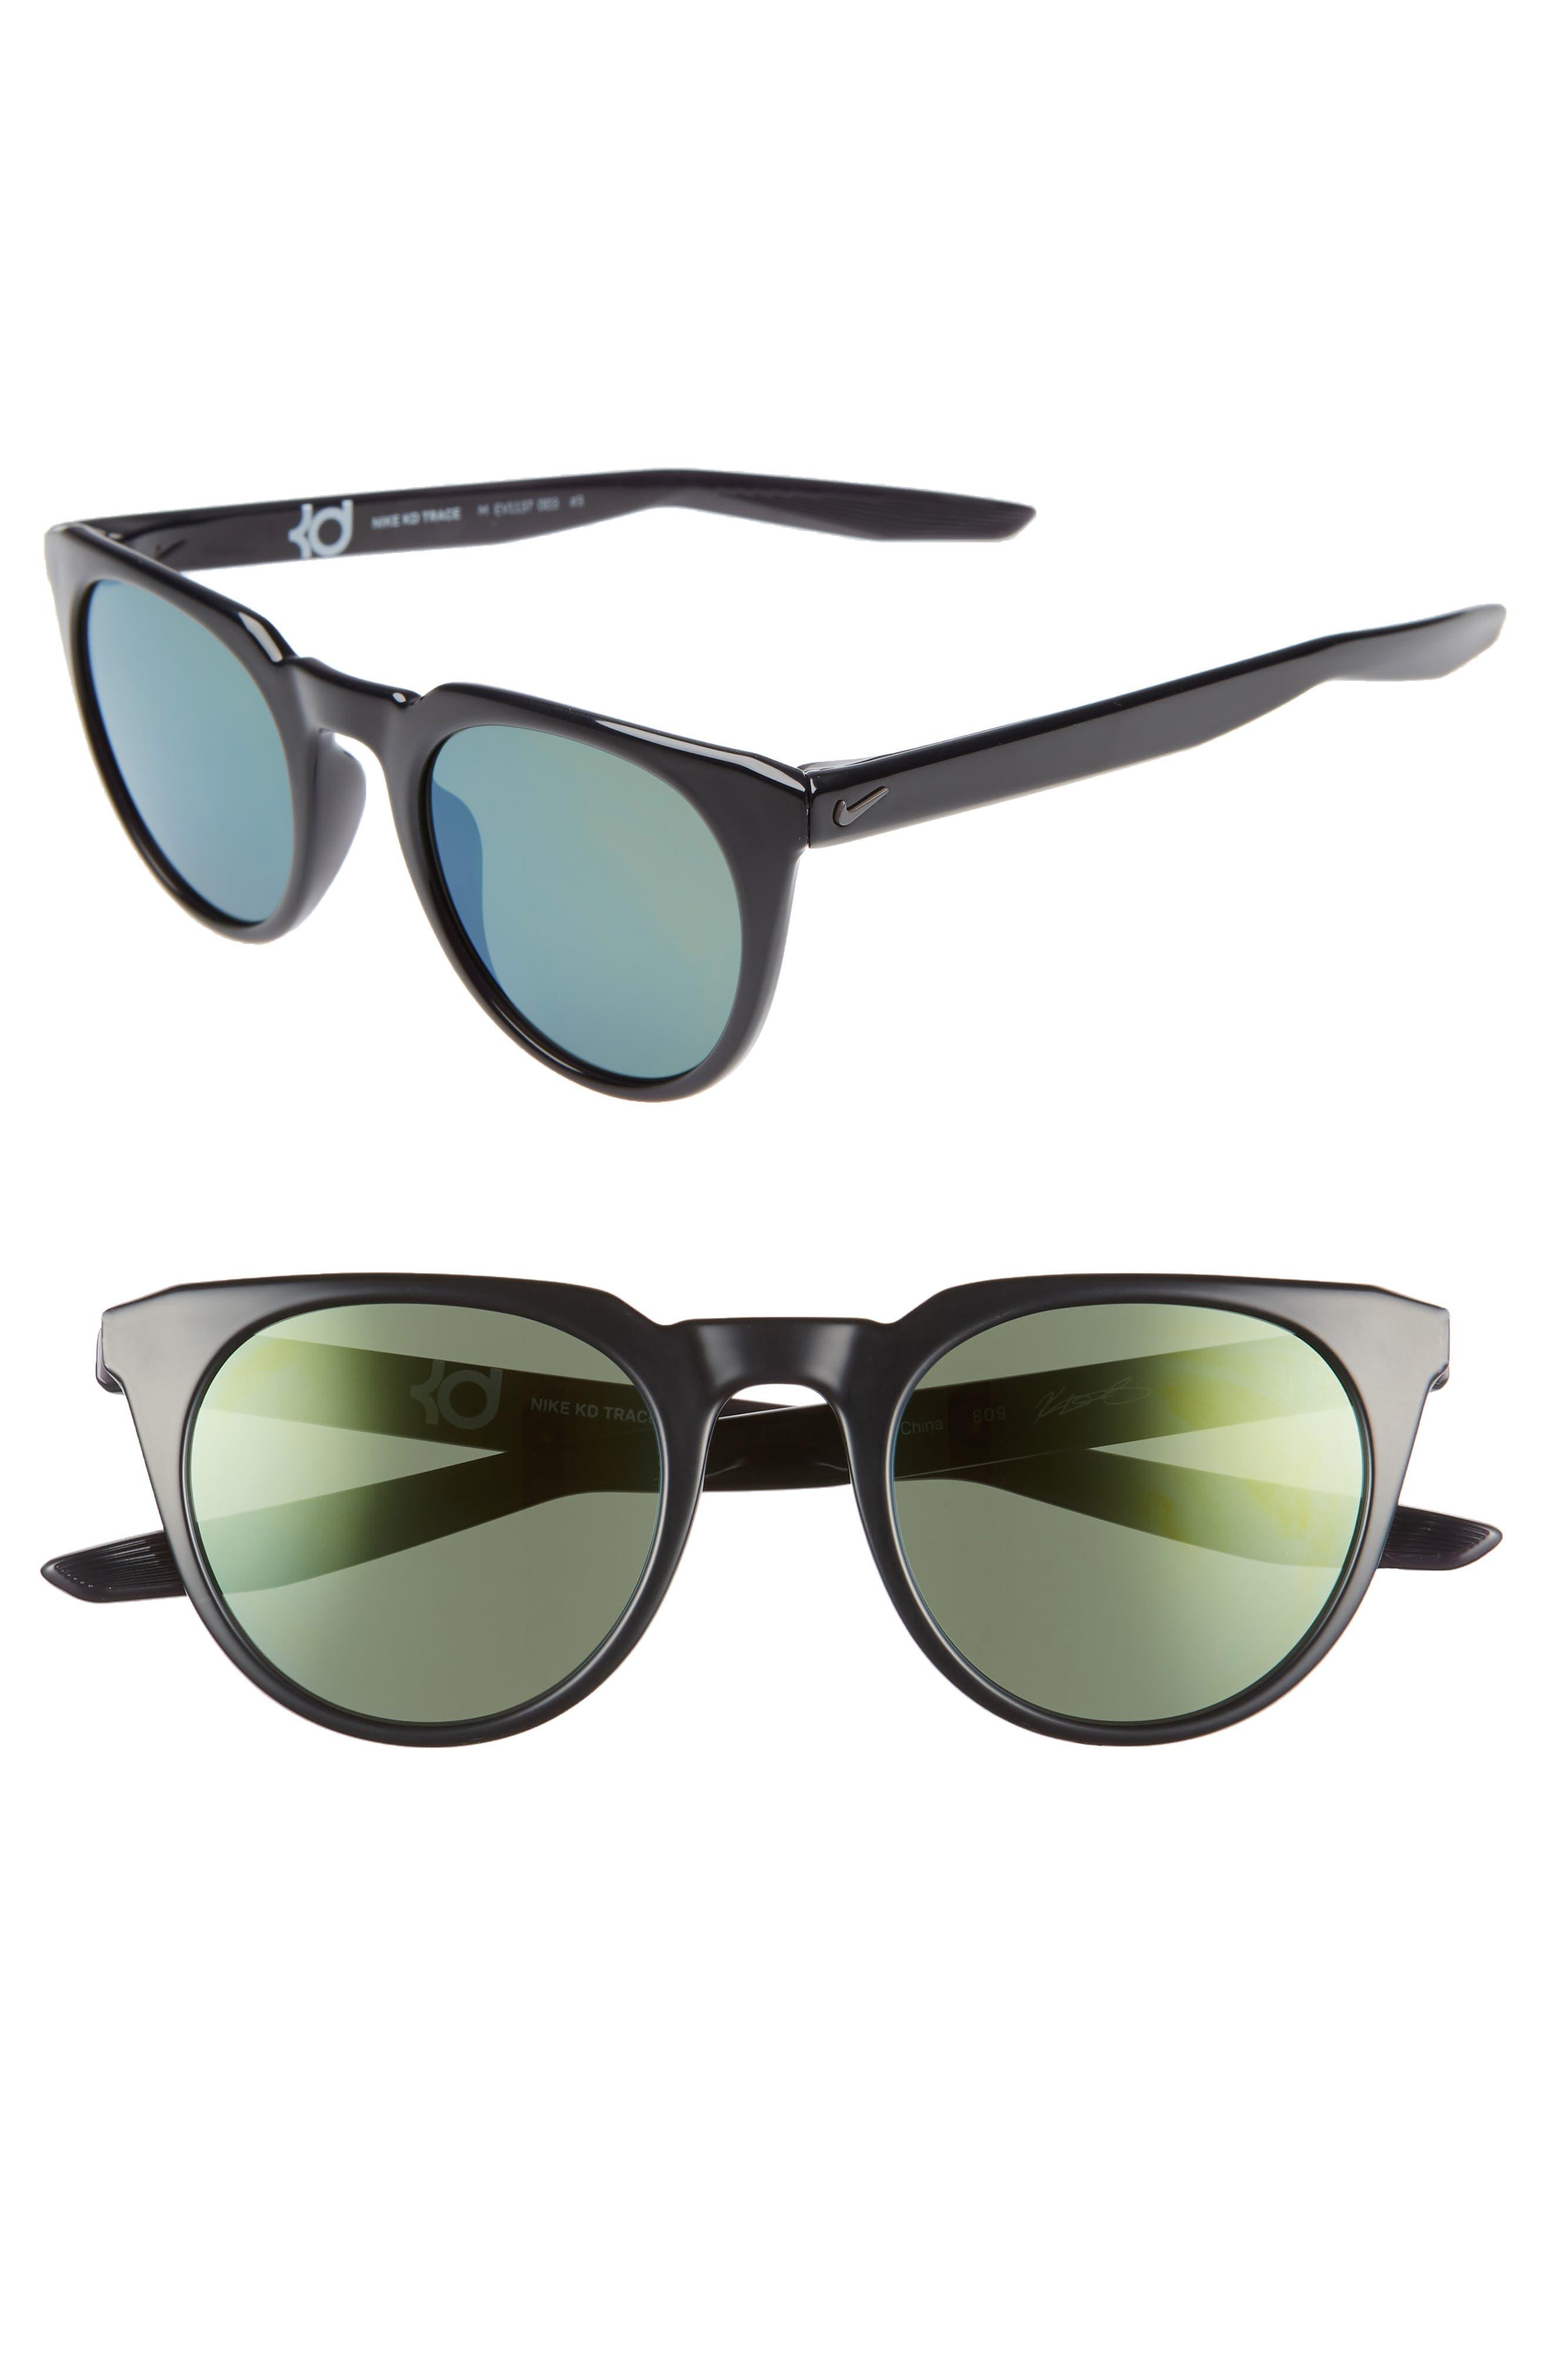 Nike Trace 4m Mirrored Round Sunglasses - Oil Grey/ Grey